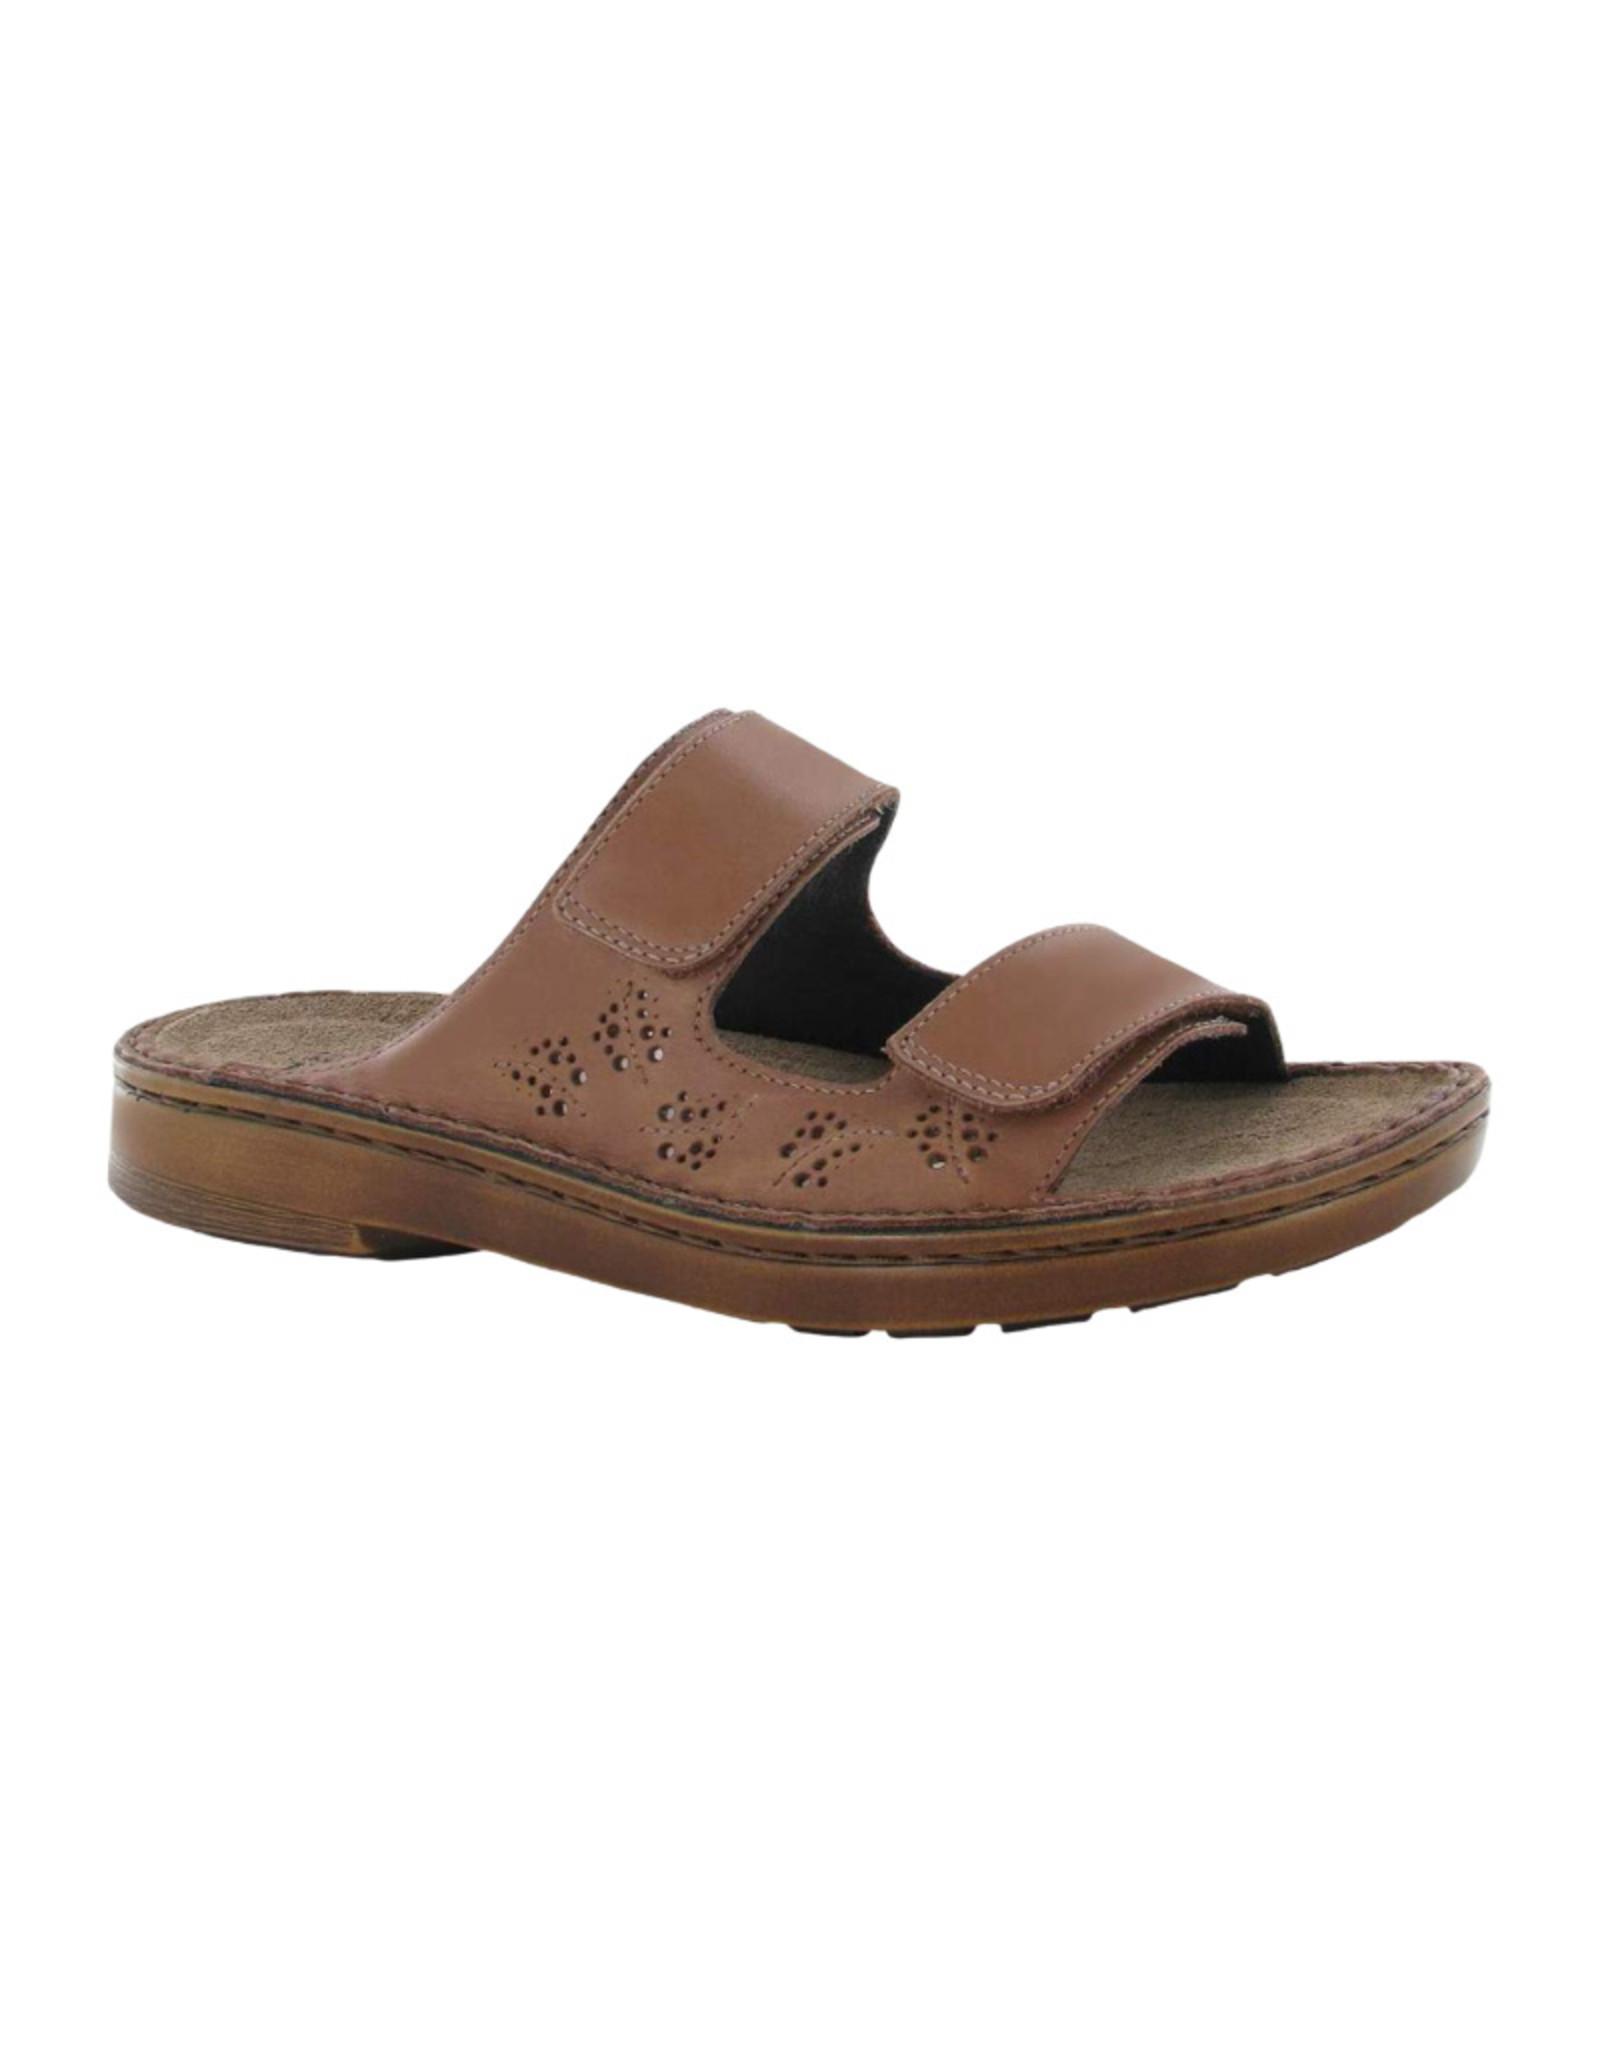 Naot Footwear Naot Trancoso Leather Slip On